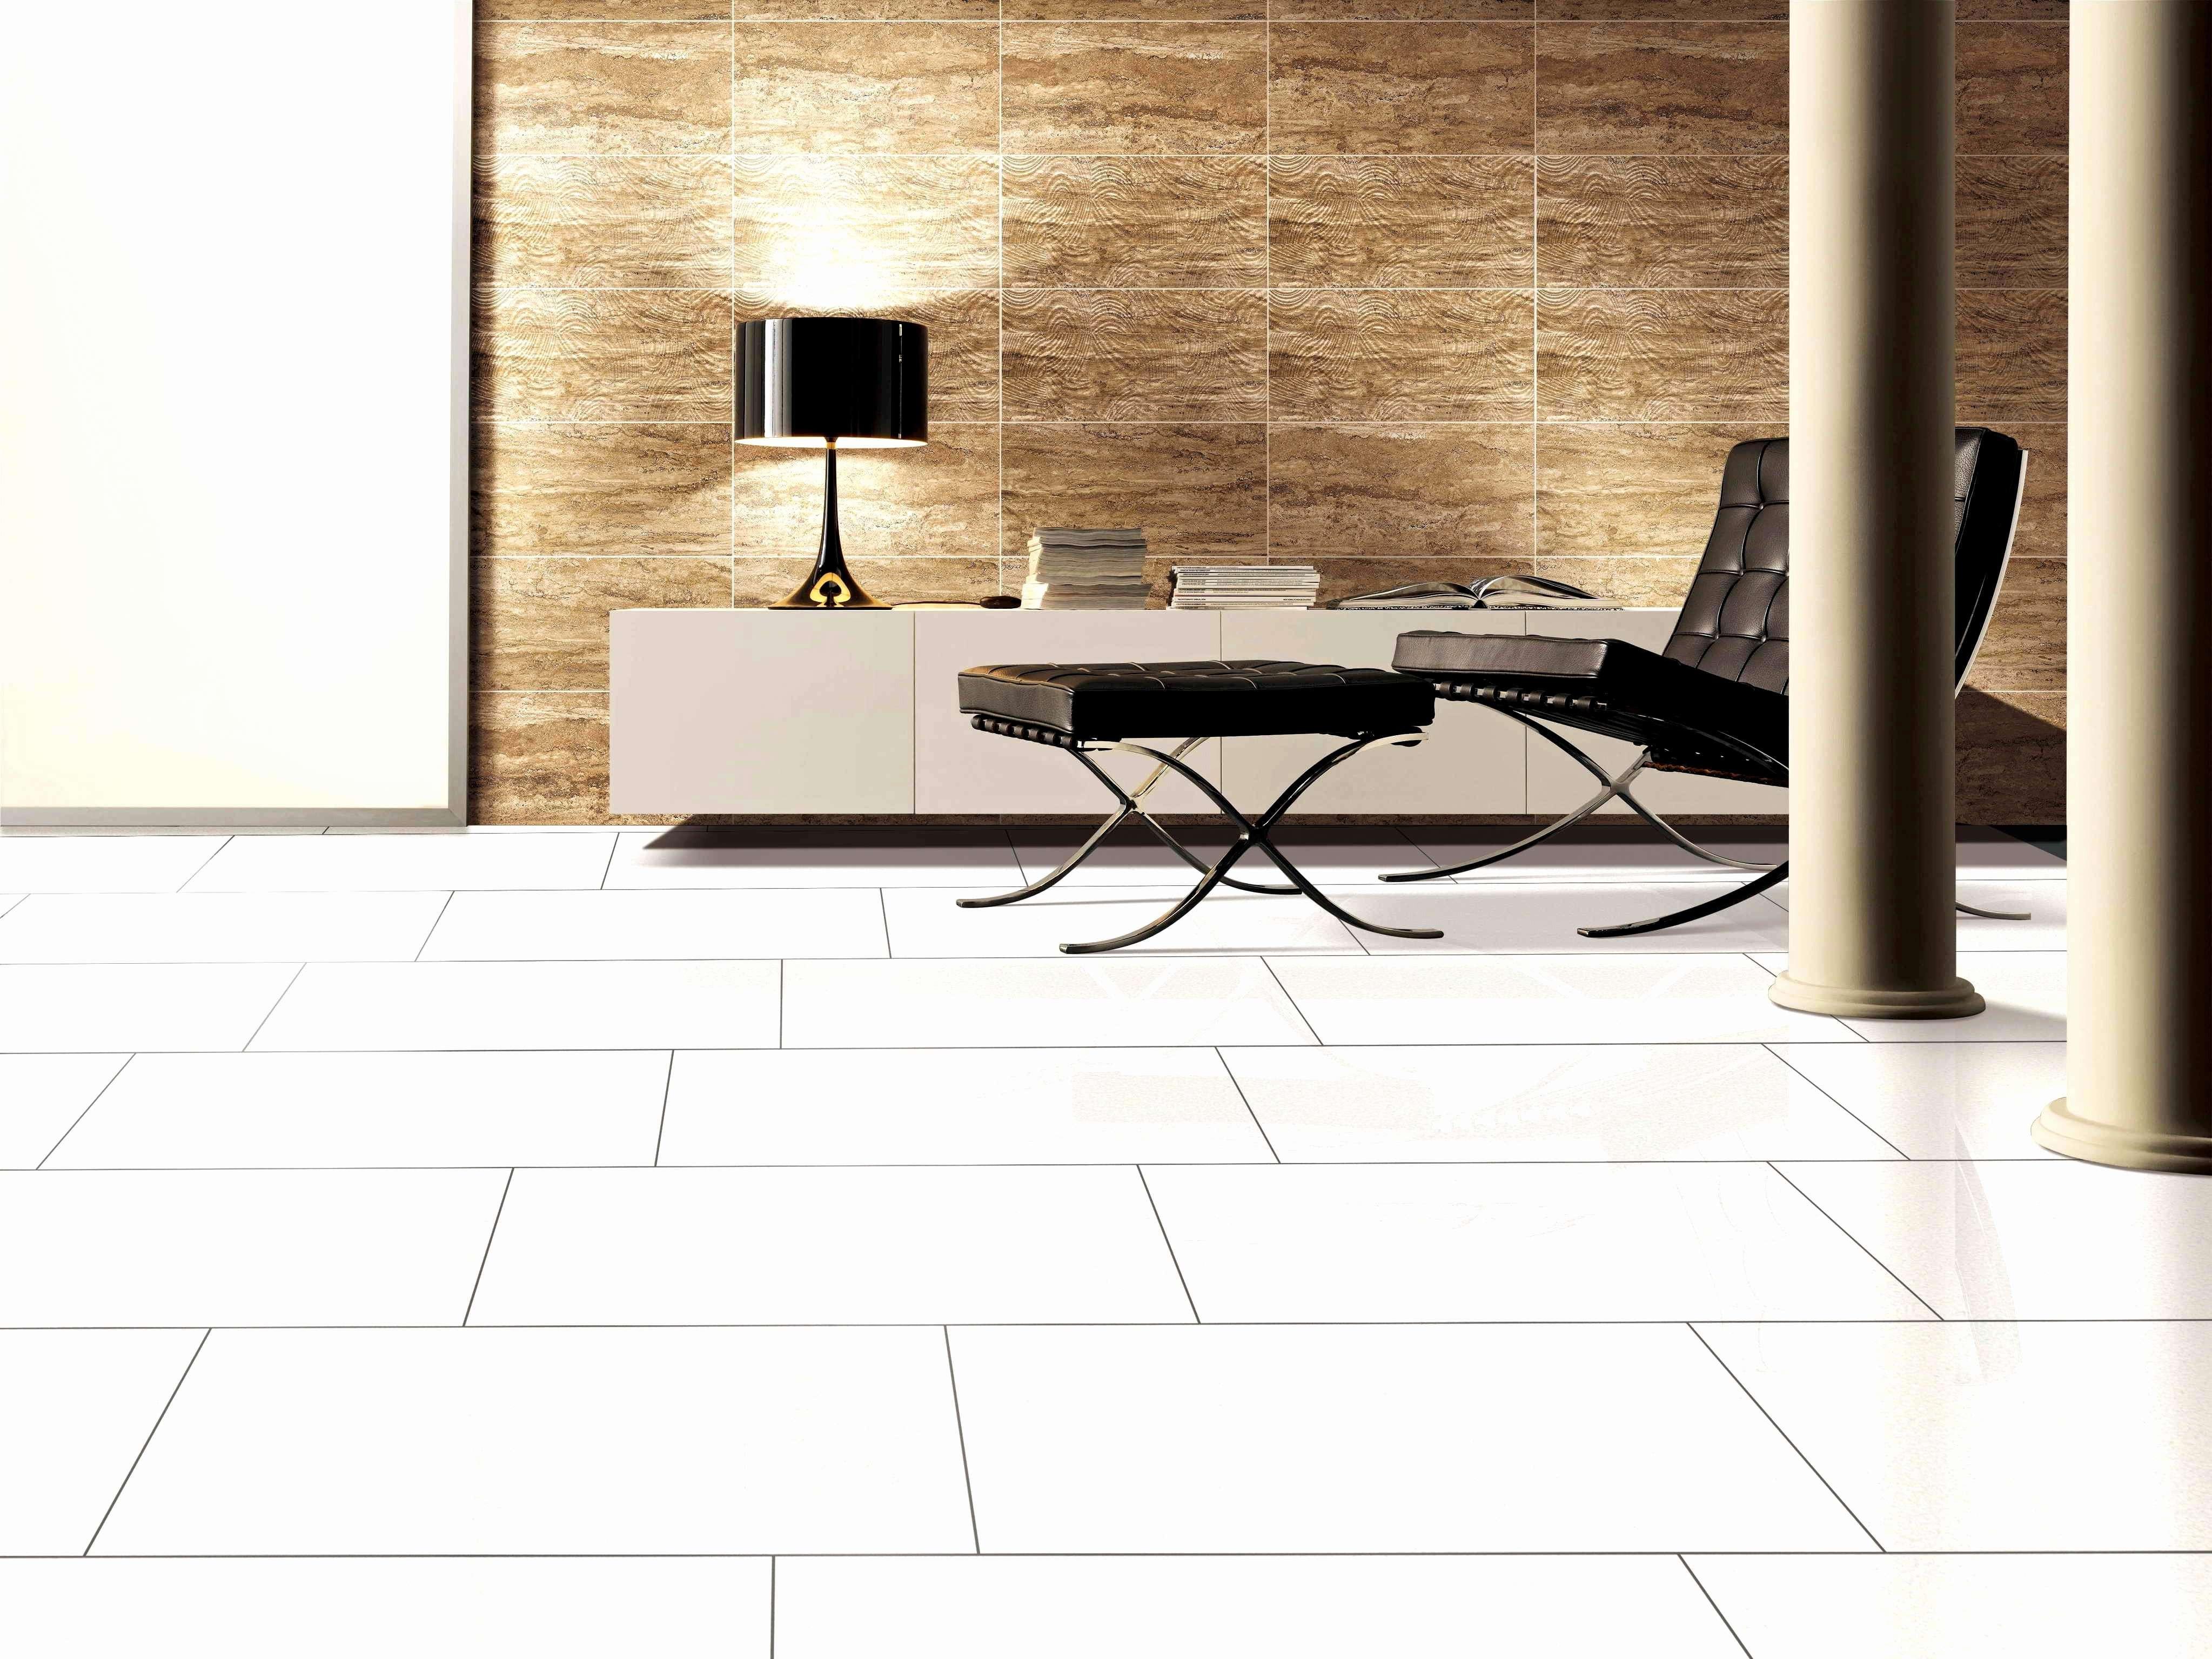 bamboo hardwood flooring prices of lovely bathroom bamboo flooring cjsrods in new tile floor mosaic bathroom 0d new bathroom floor tiles home hardwood floor estimate evergreen hardwood floors